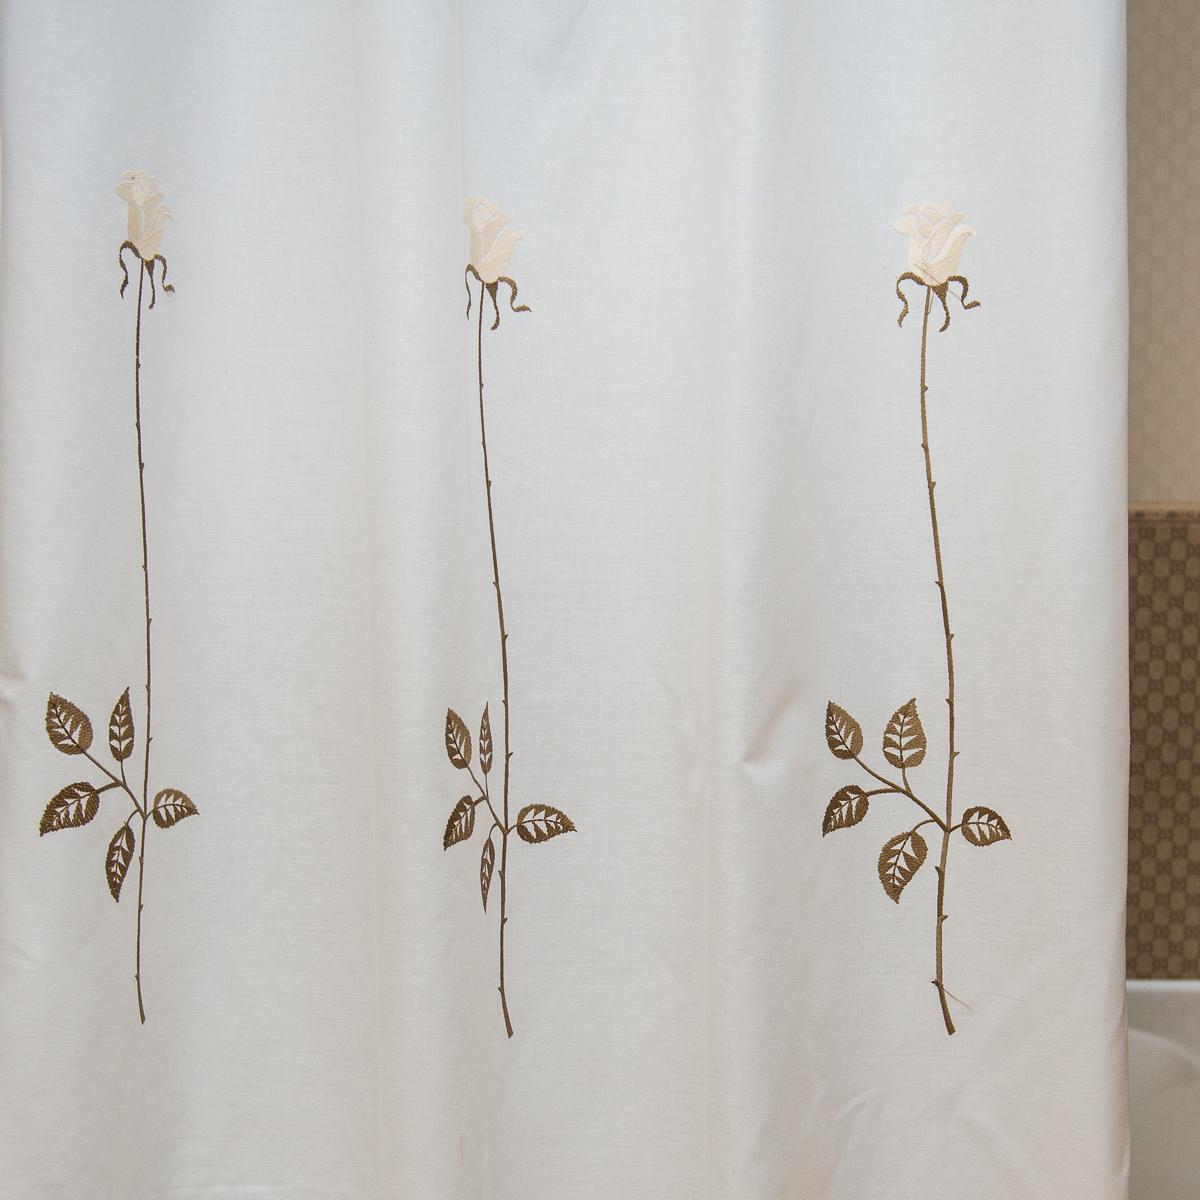 Шторки Шторка для ванной 180x200 Arti-Deco Rosas C. Beige elitnaya-shtorka-dlya-vannoy-rosas-c-beige-ot-arti-deco-ispaniya.jpg